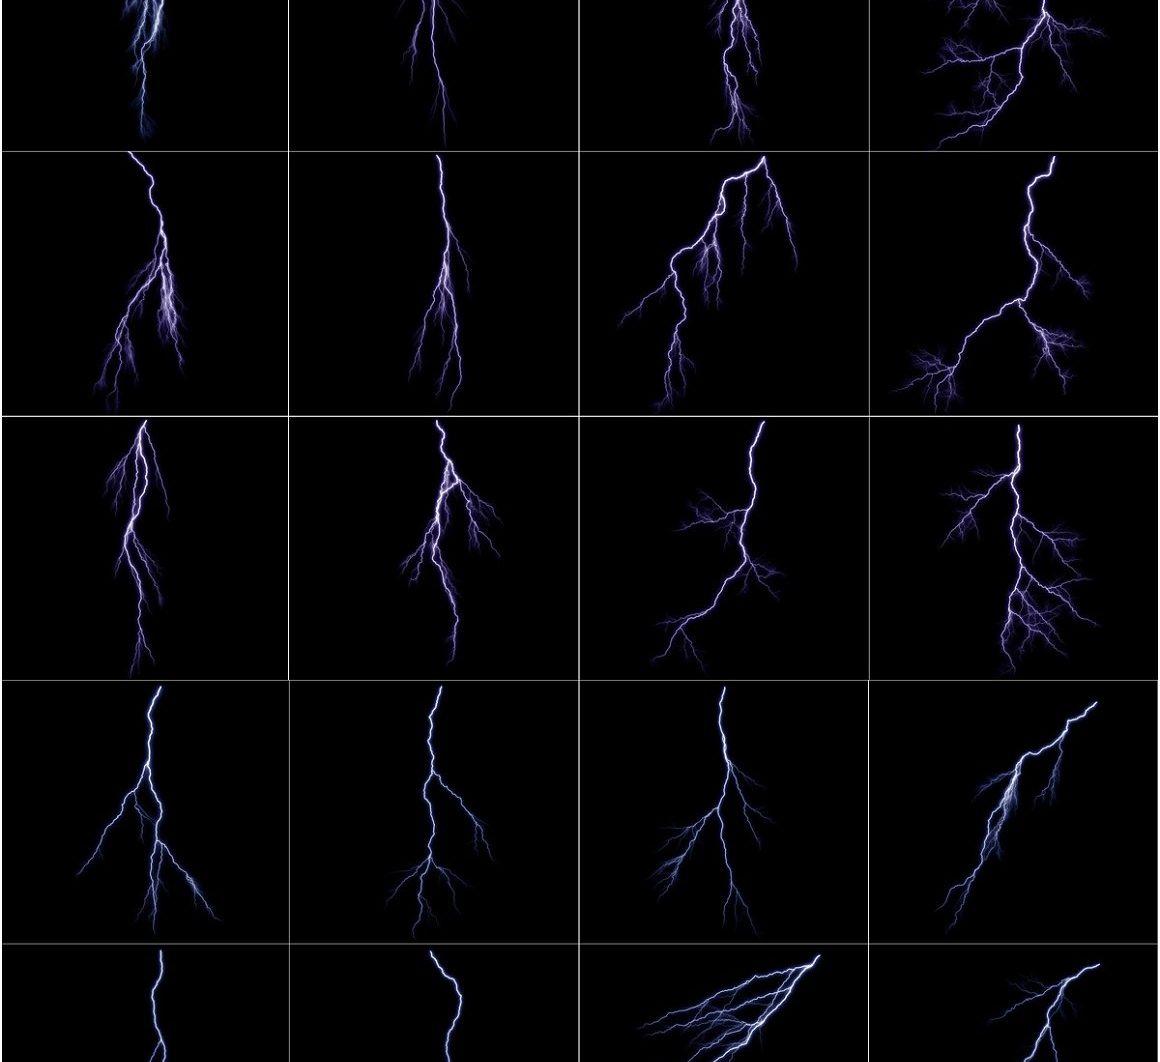 Lightning Effect Overlays - lightning overlays prev 2 scaled -